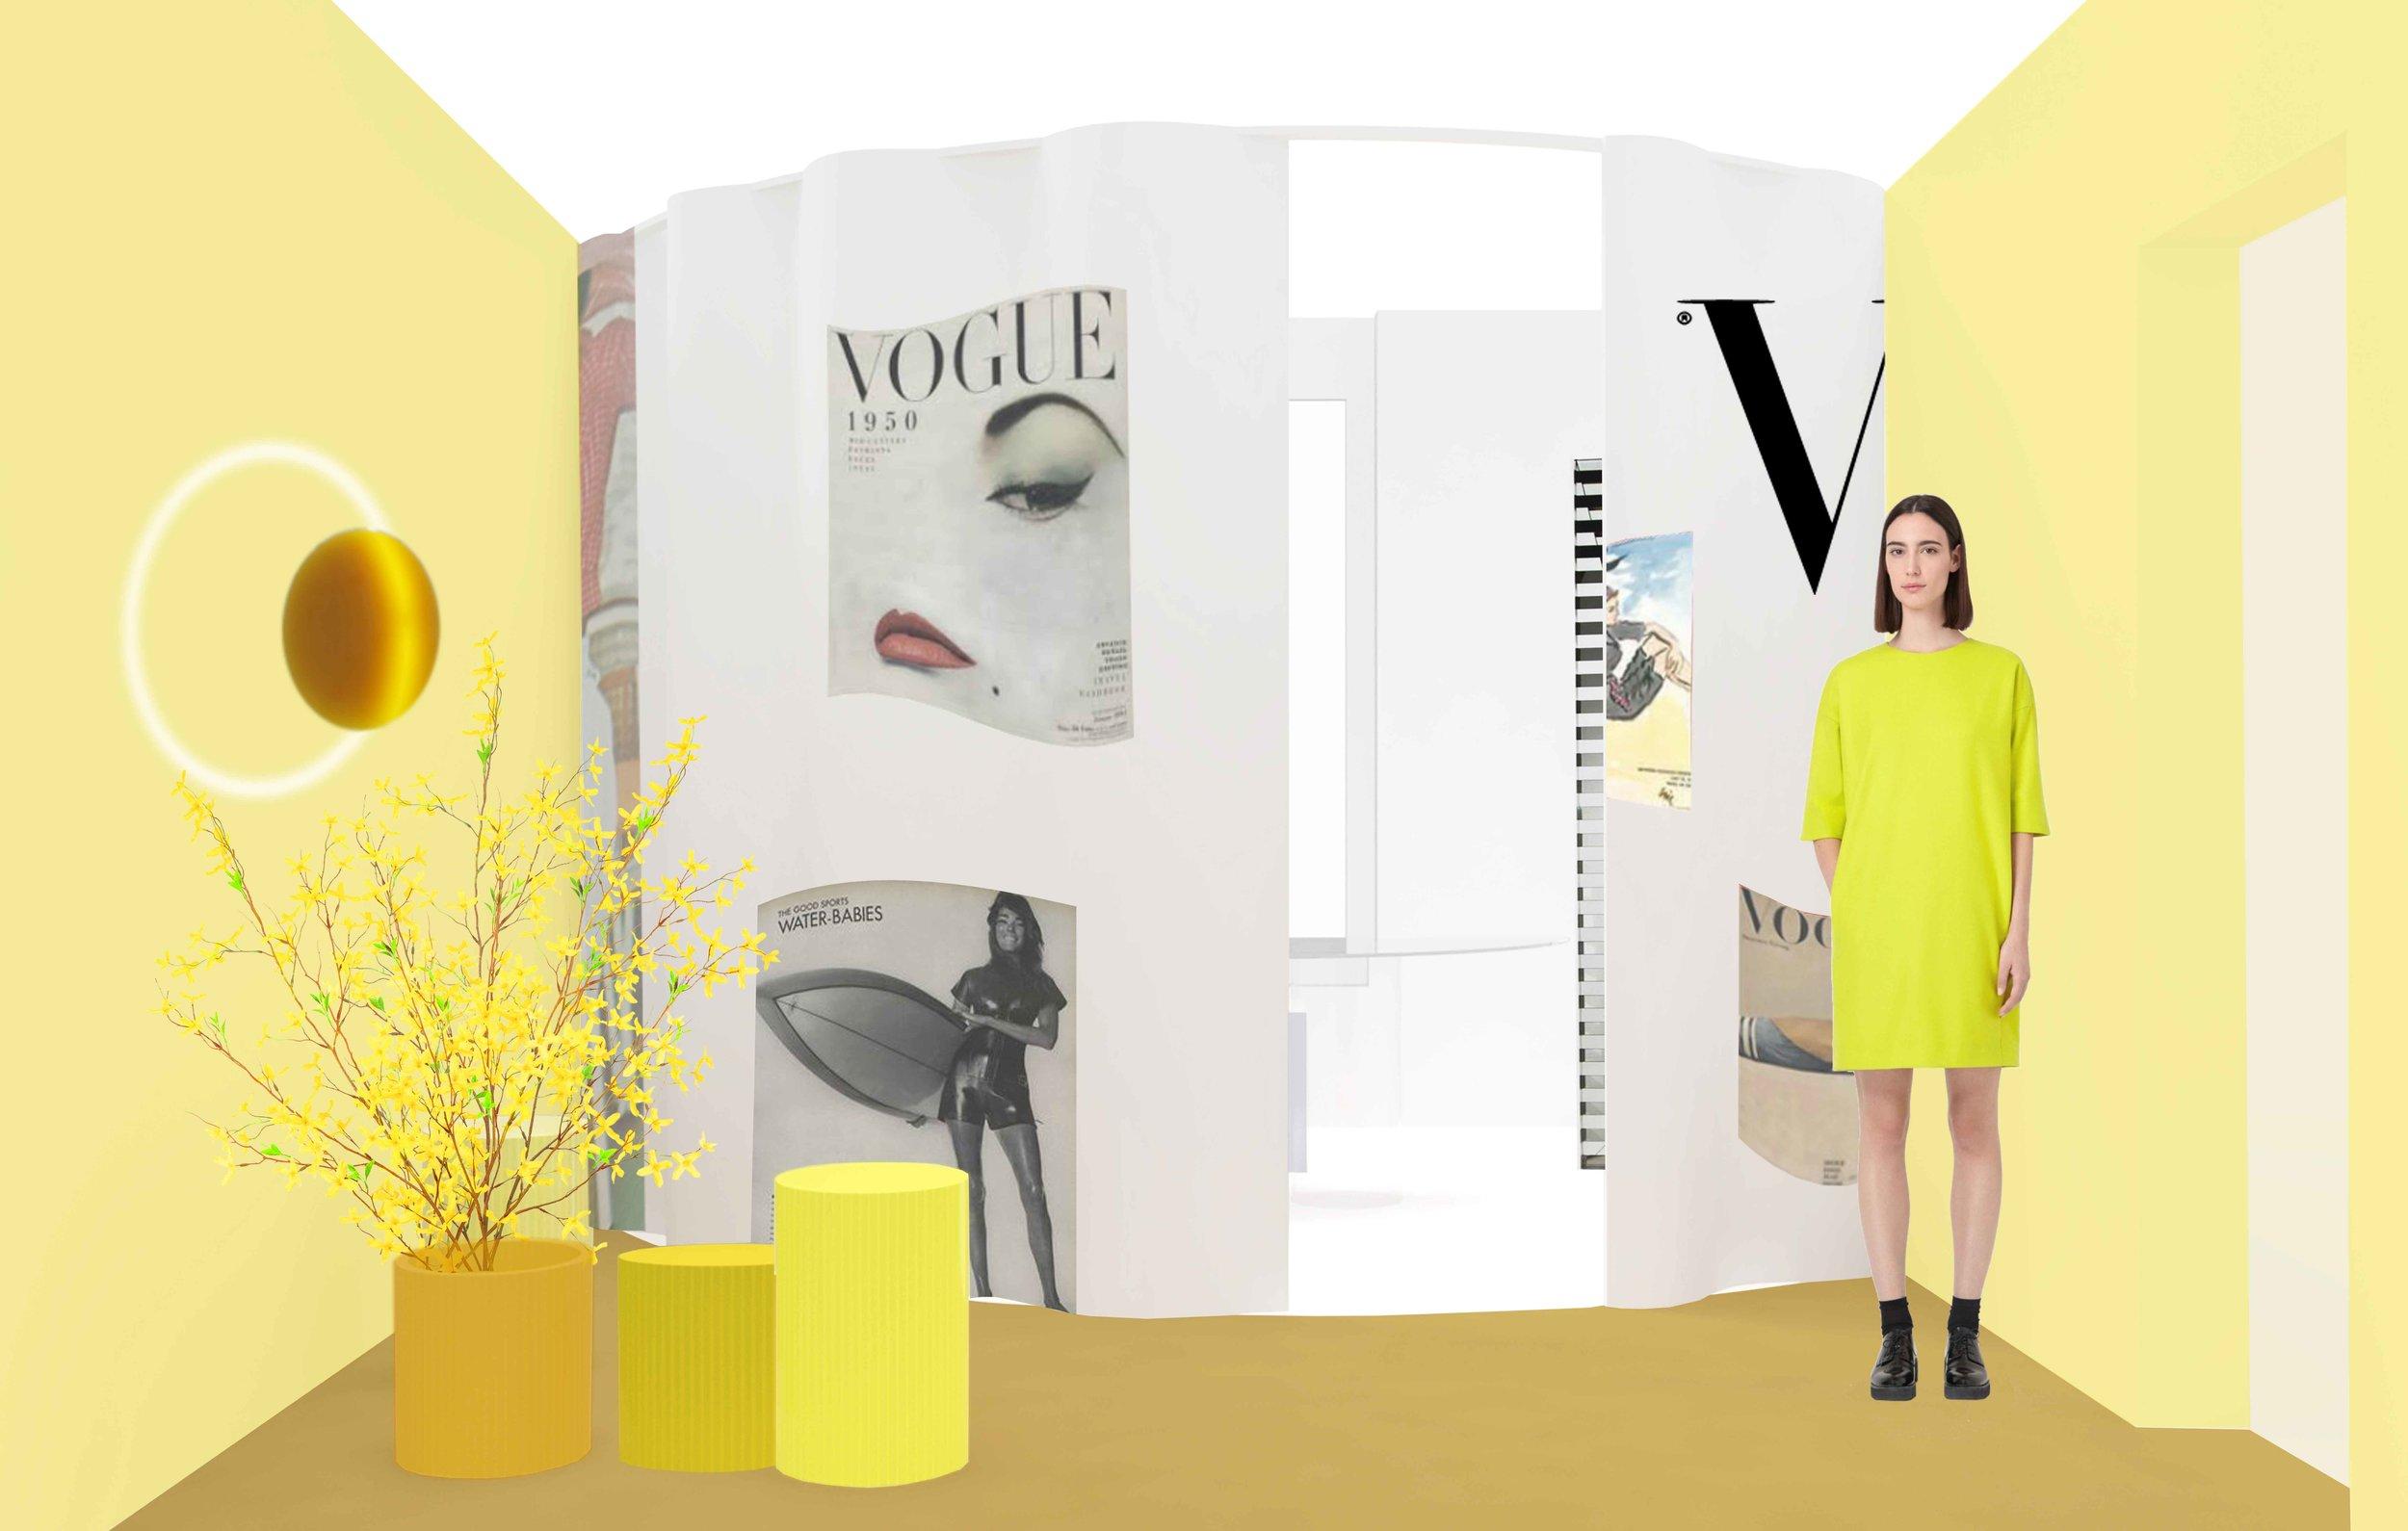 Life in Vogue  by SABINE MARCELIS